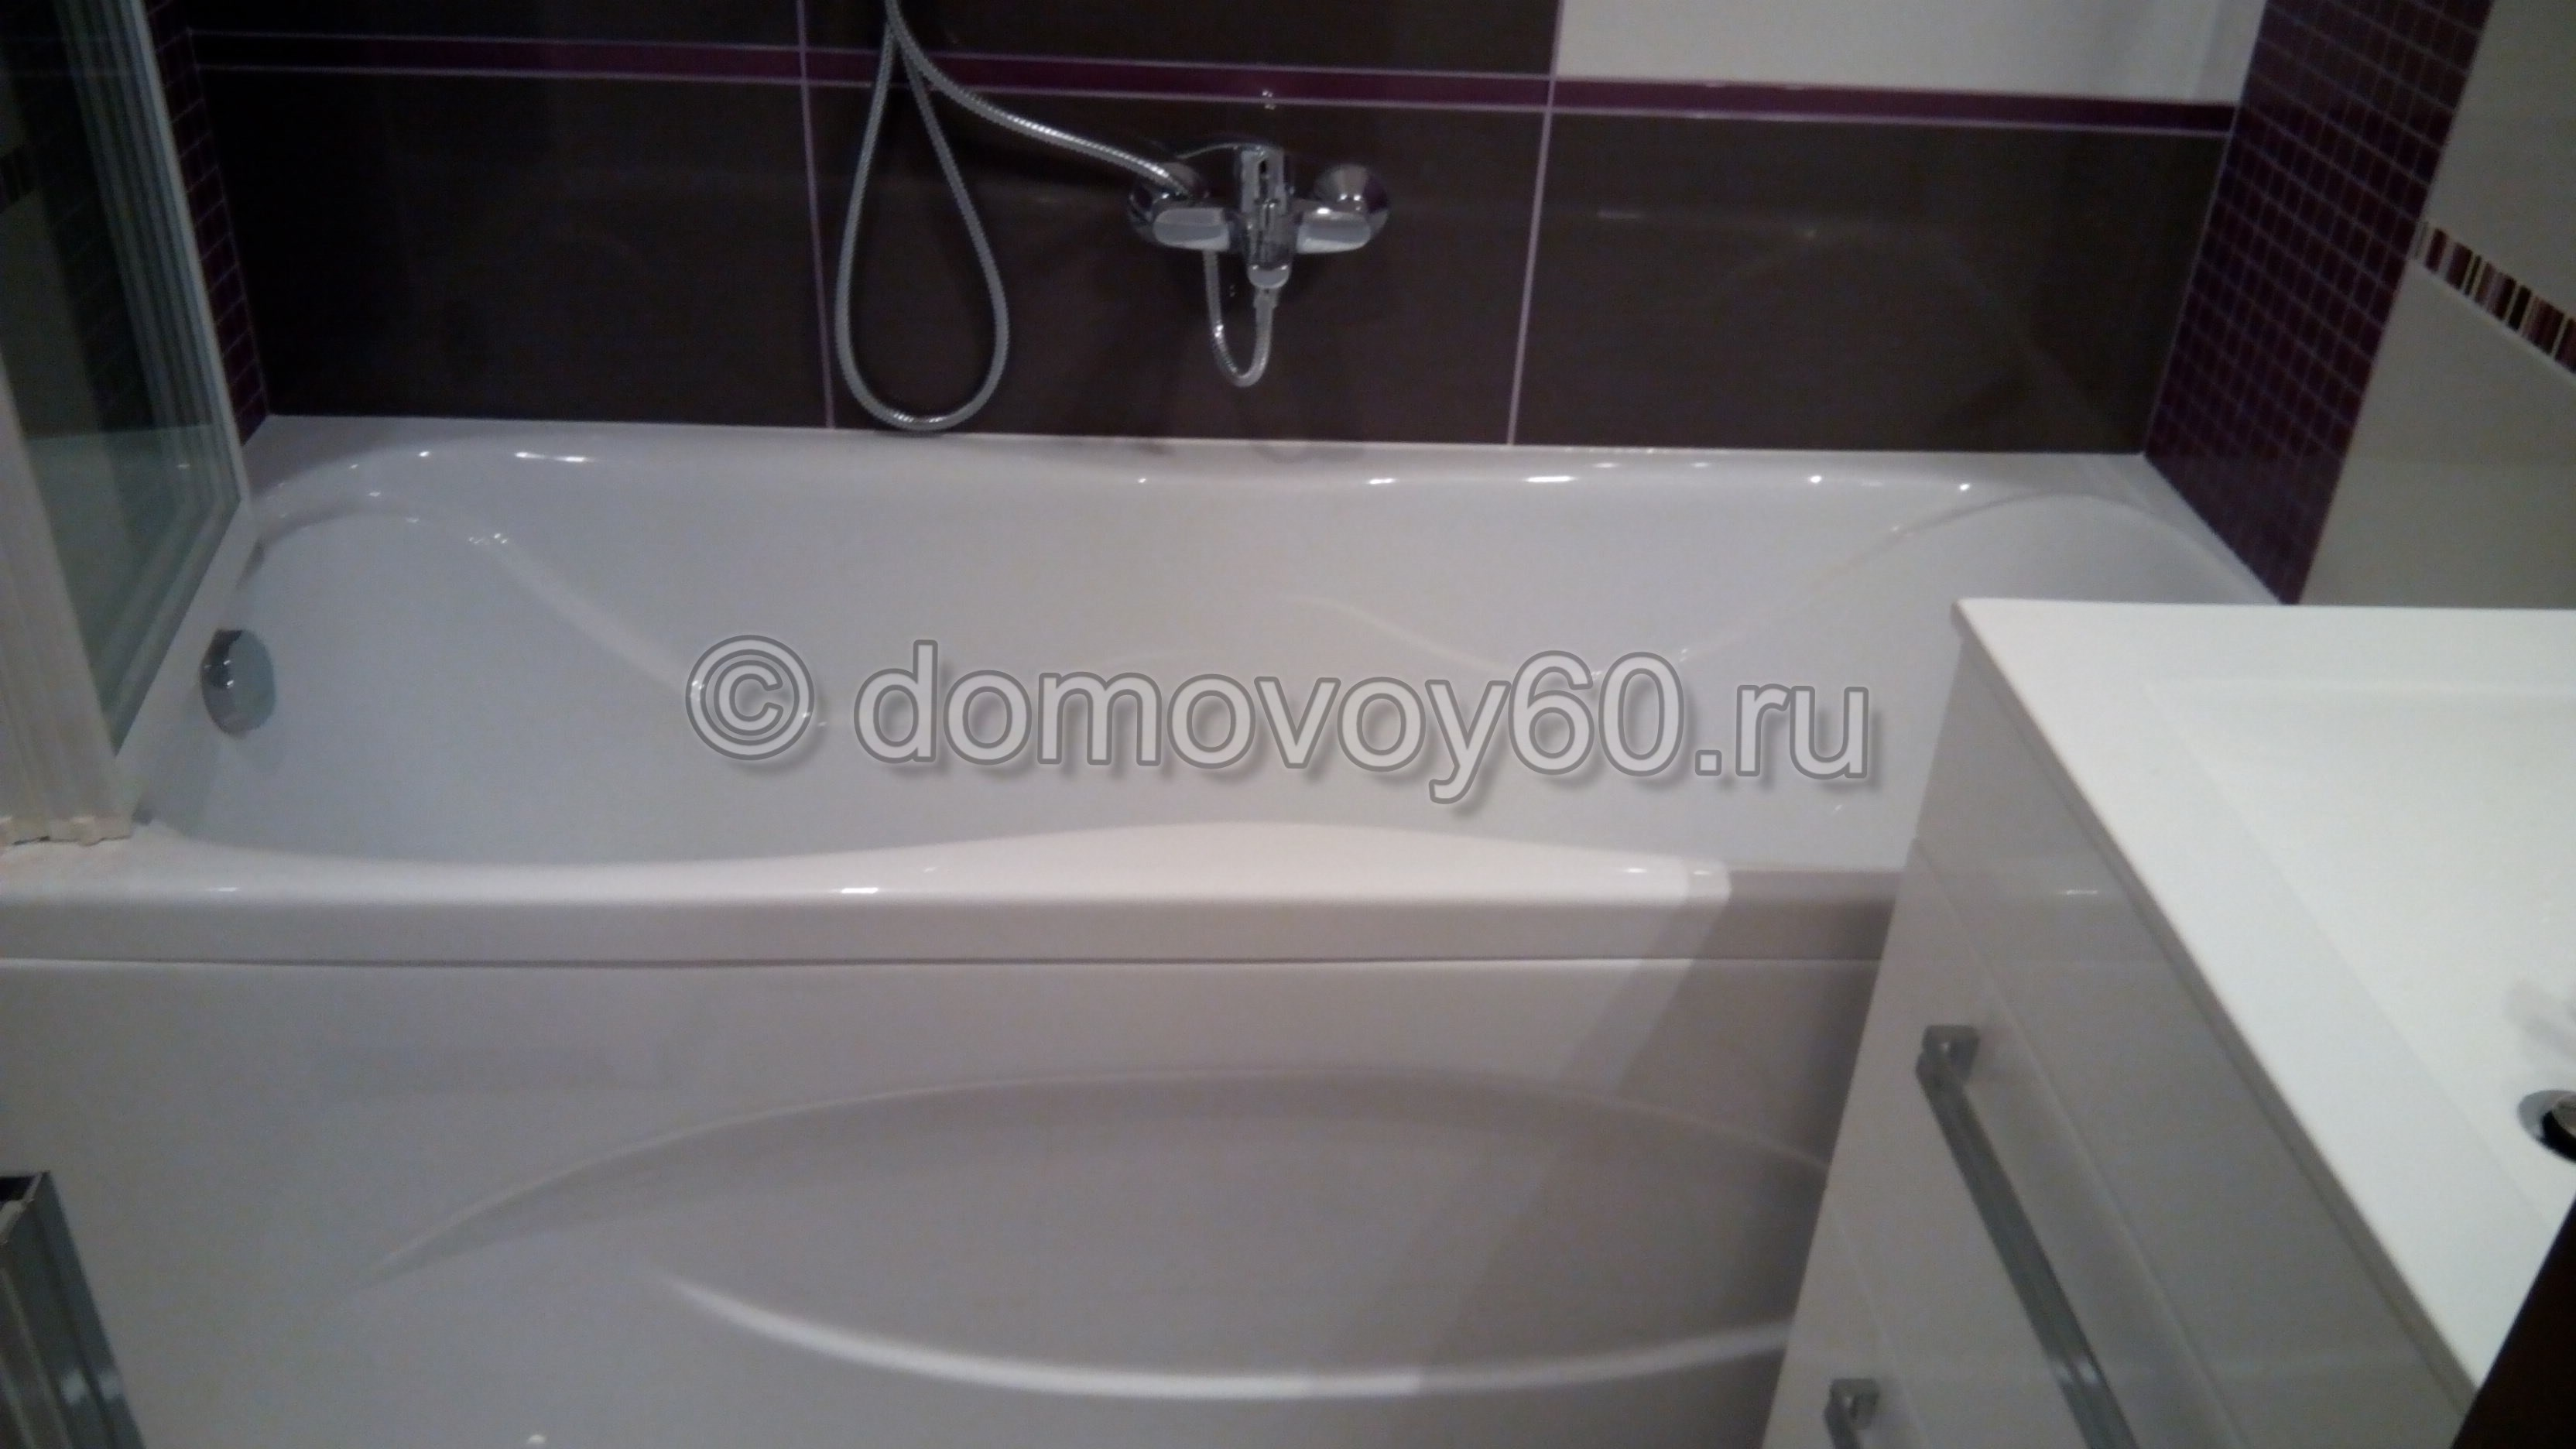 domovoy60-089